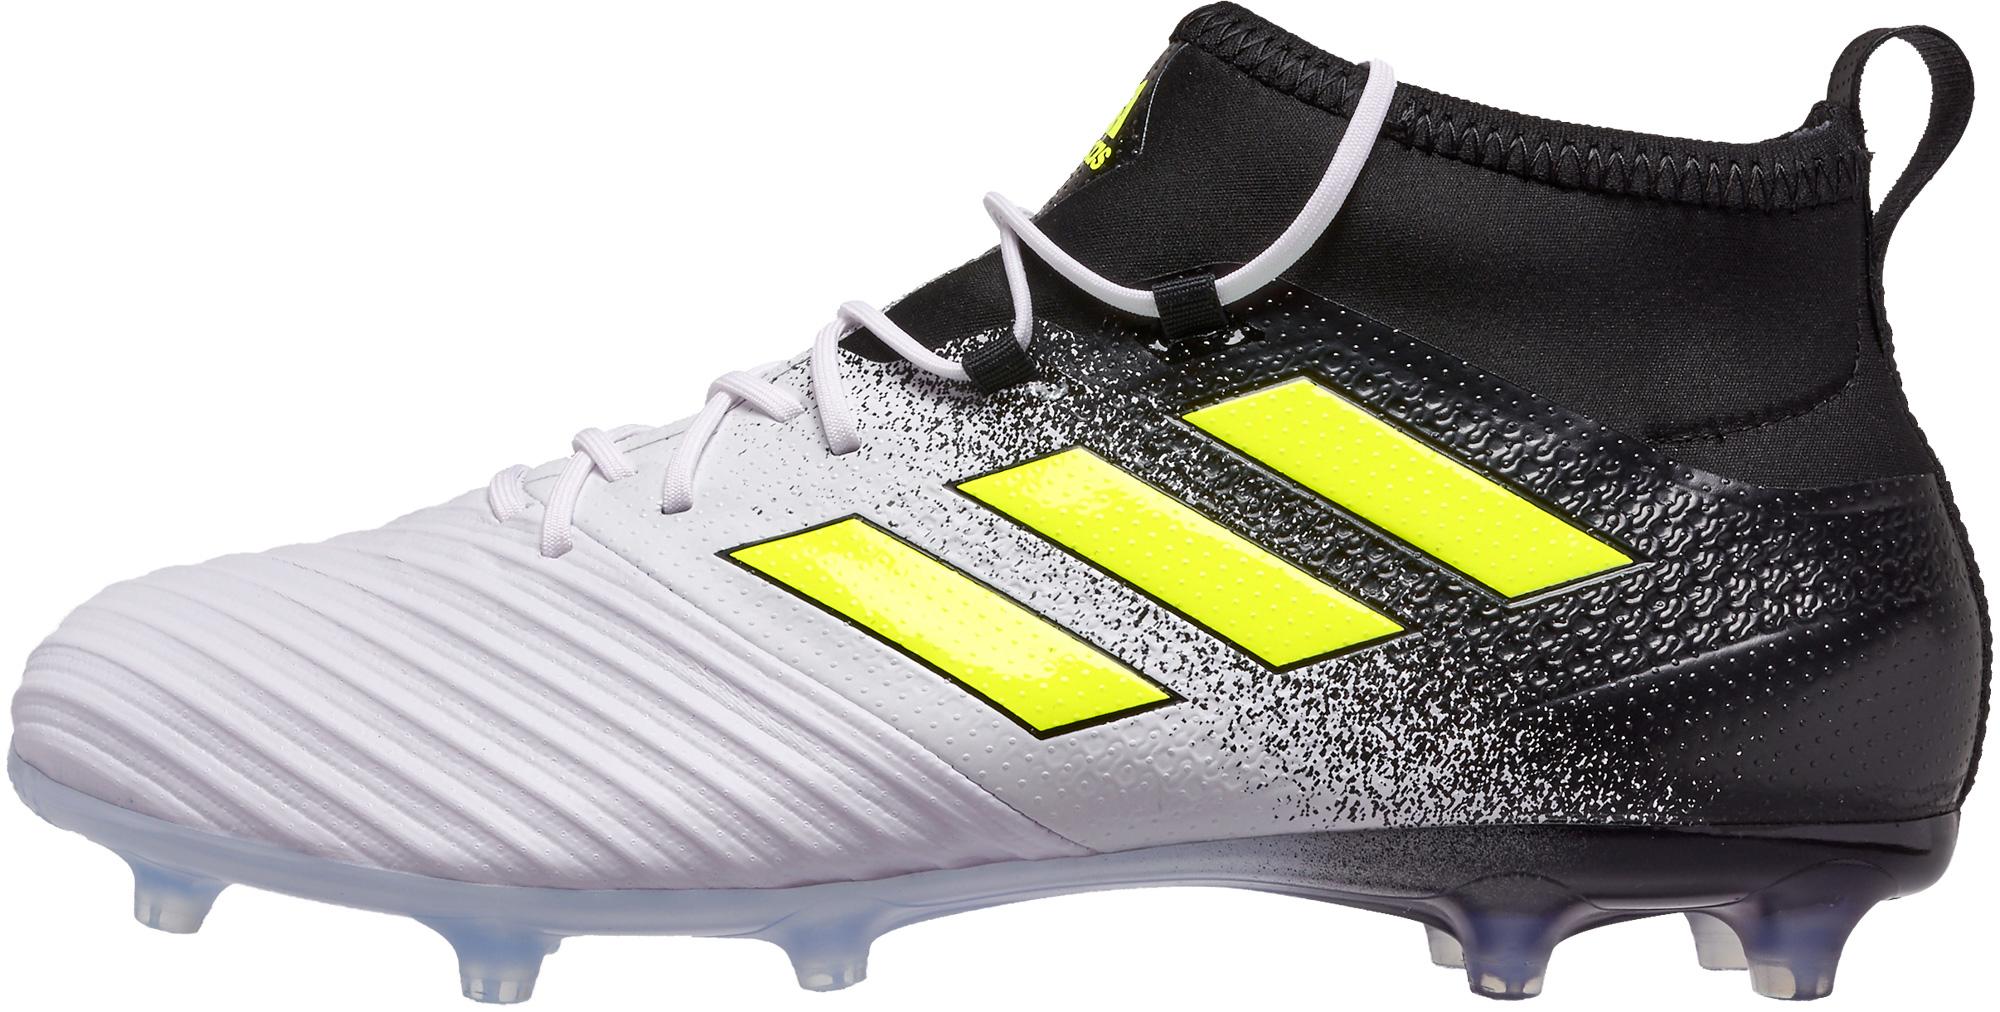 f200e17cd604 adidas ACE 17.2 Primemesh FG Soccer Cleats - White